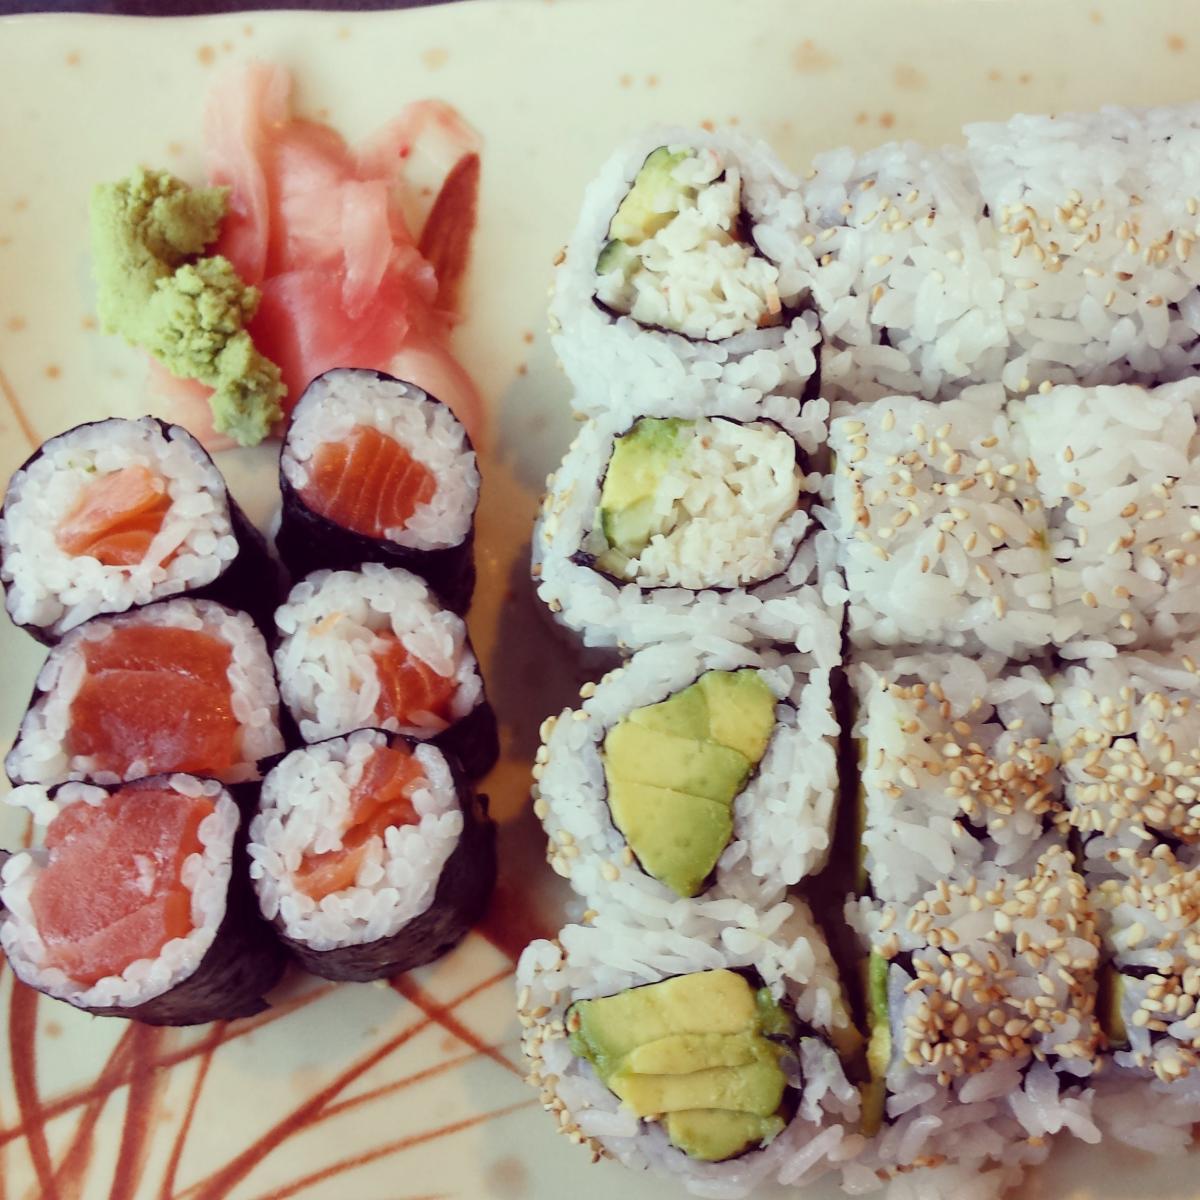 Food Meal Plate #159522